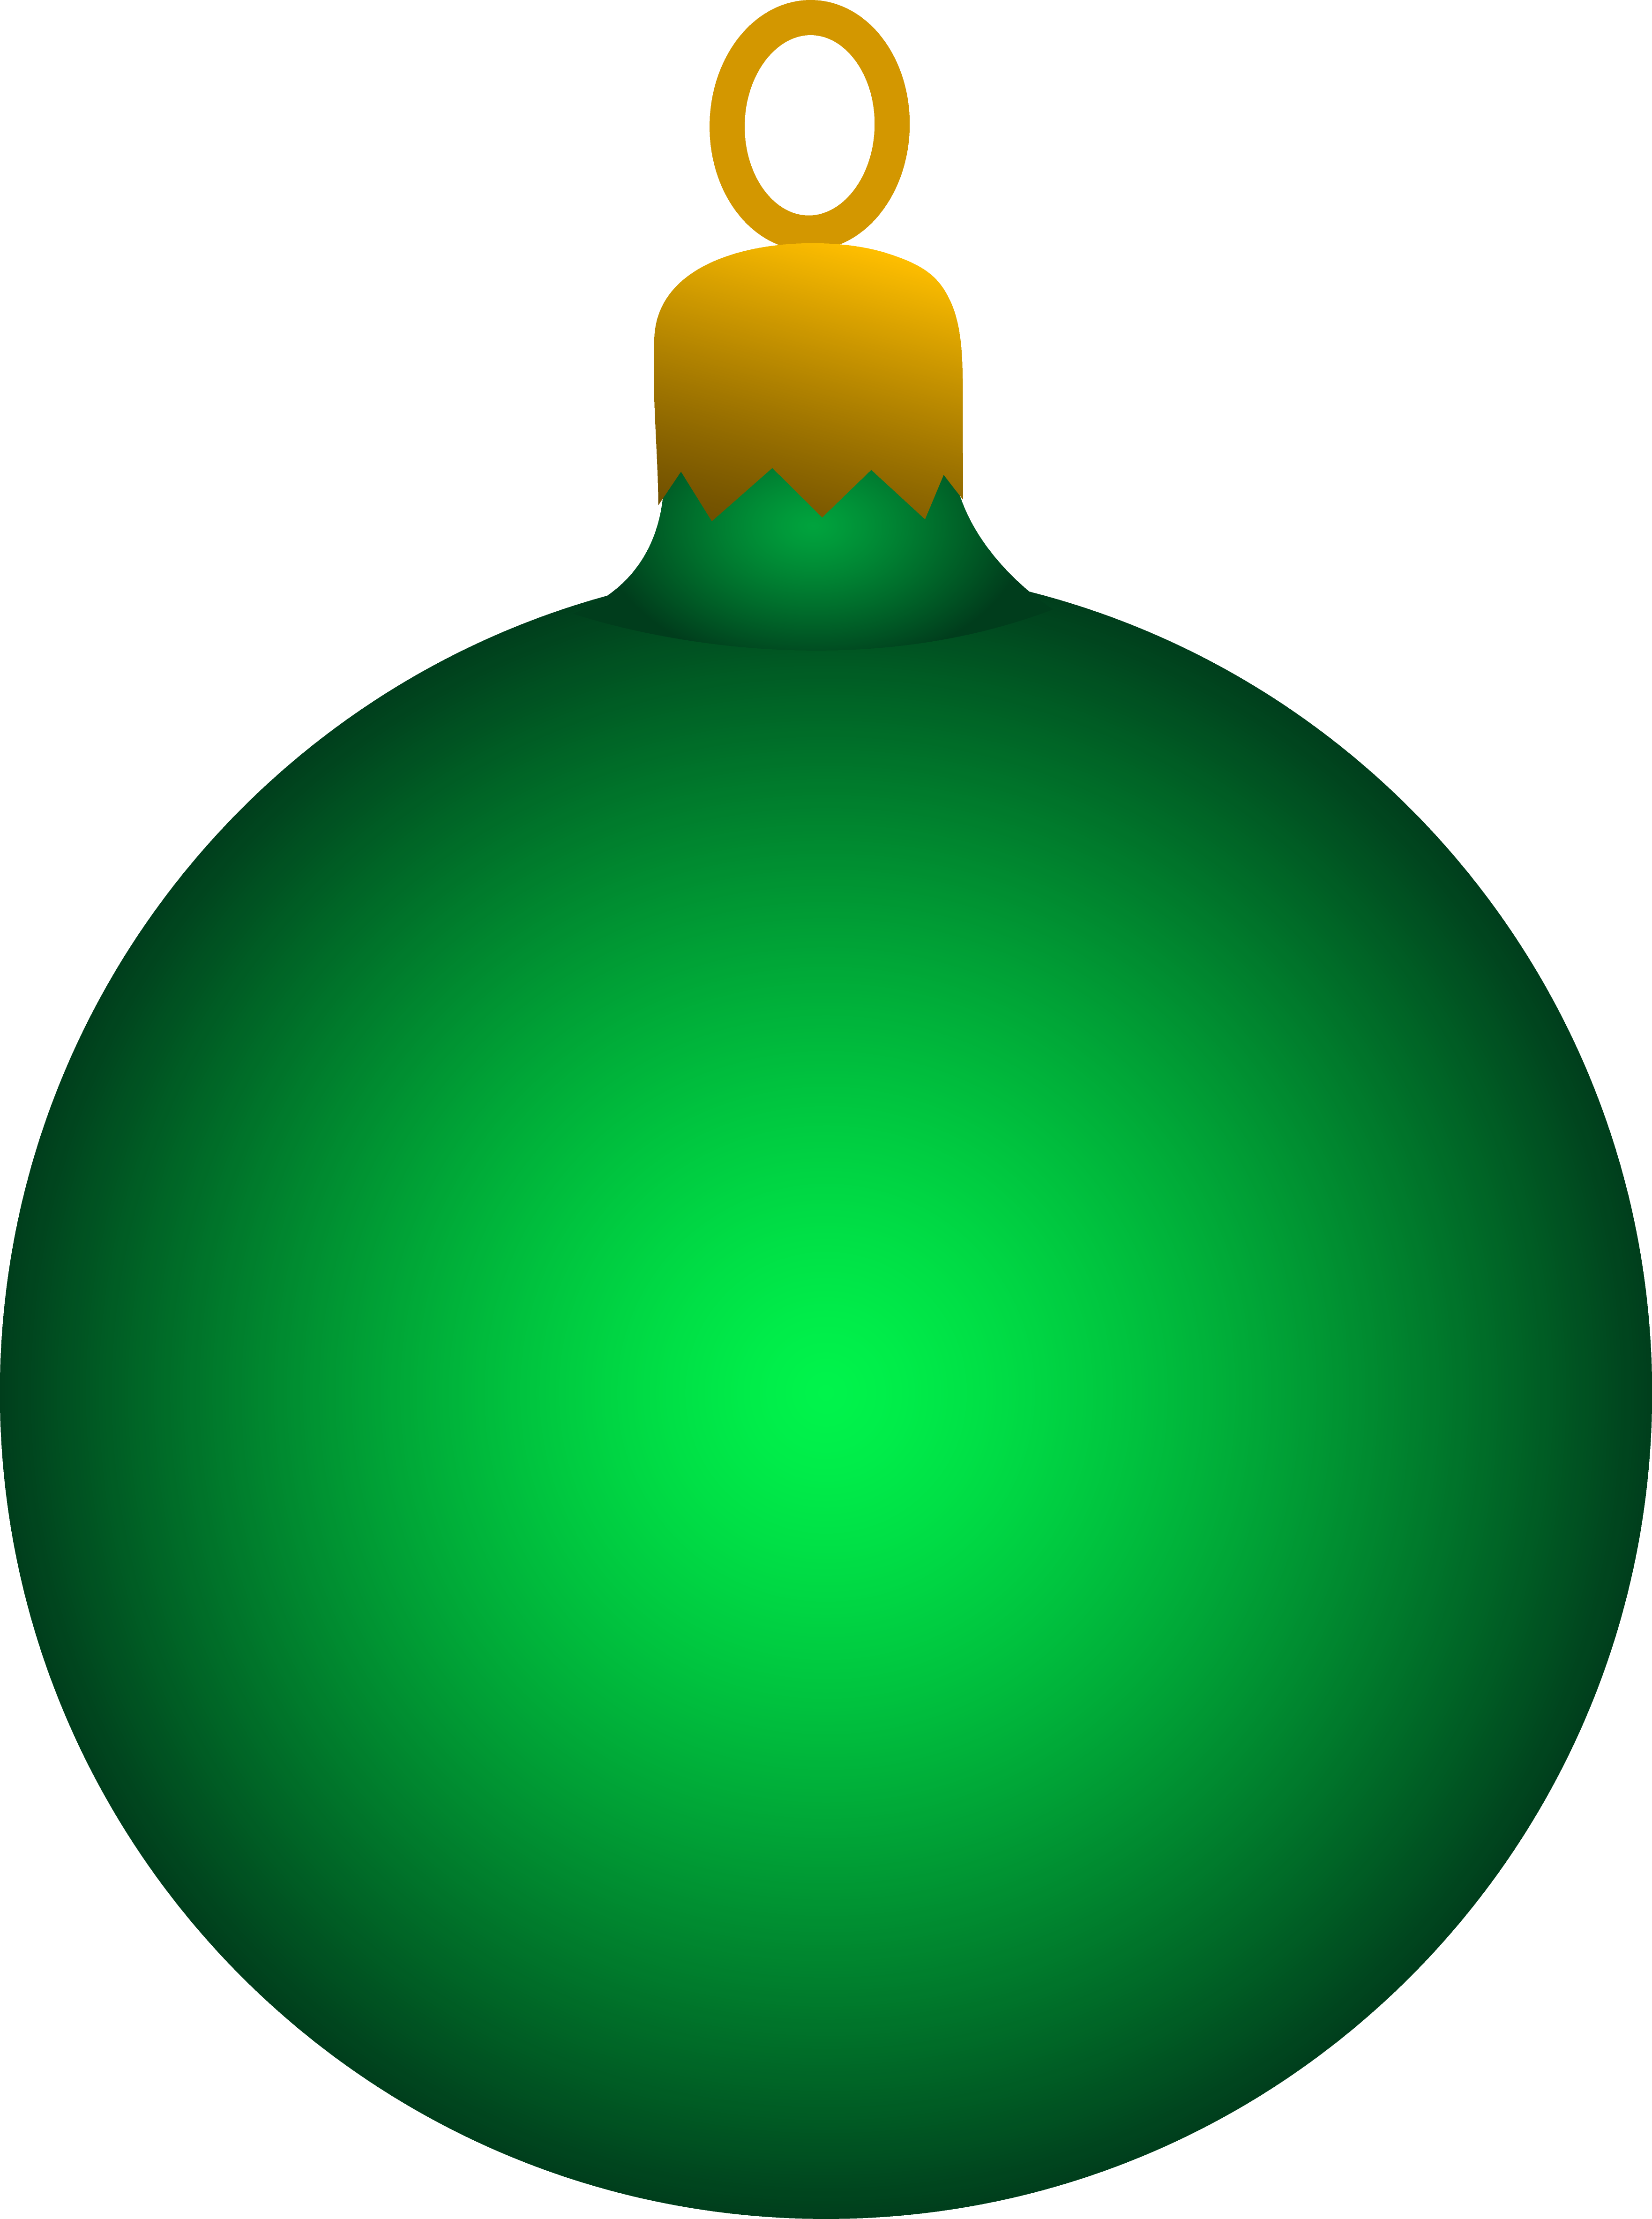 Balls clipart ornament. Christmas tree